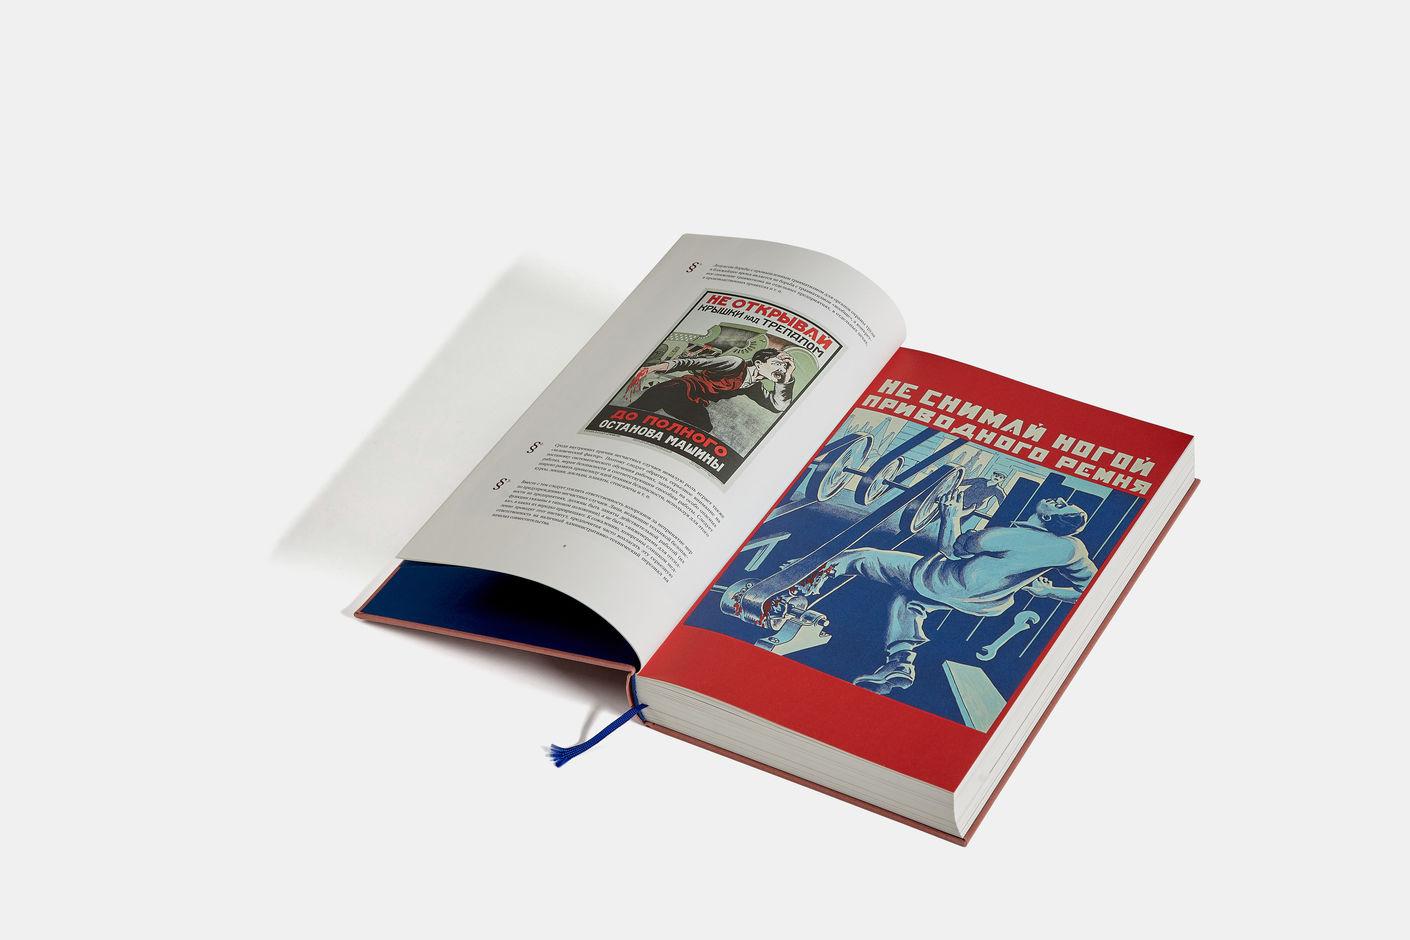 Подарочная книга Техника безопасности, Агей Томеш